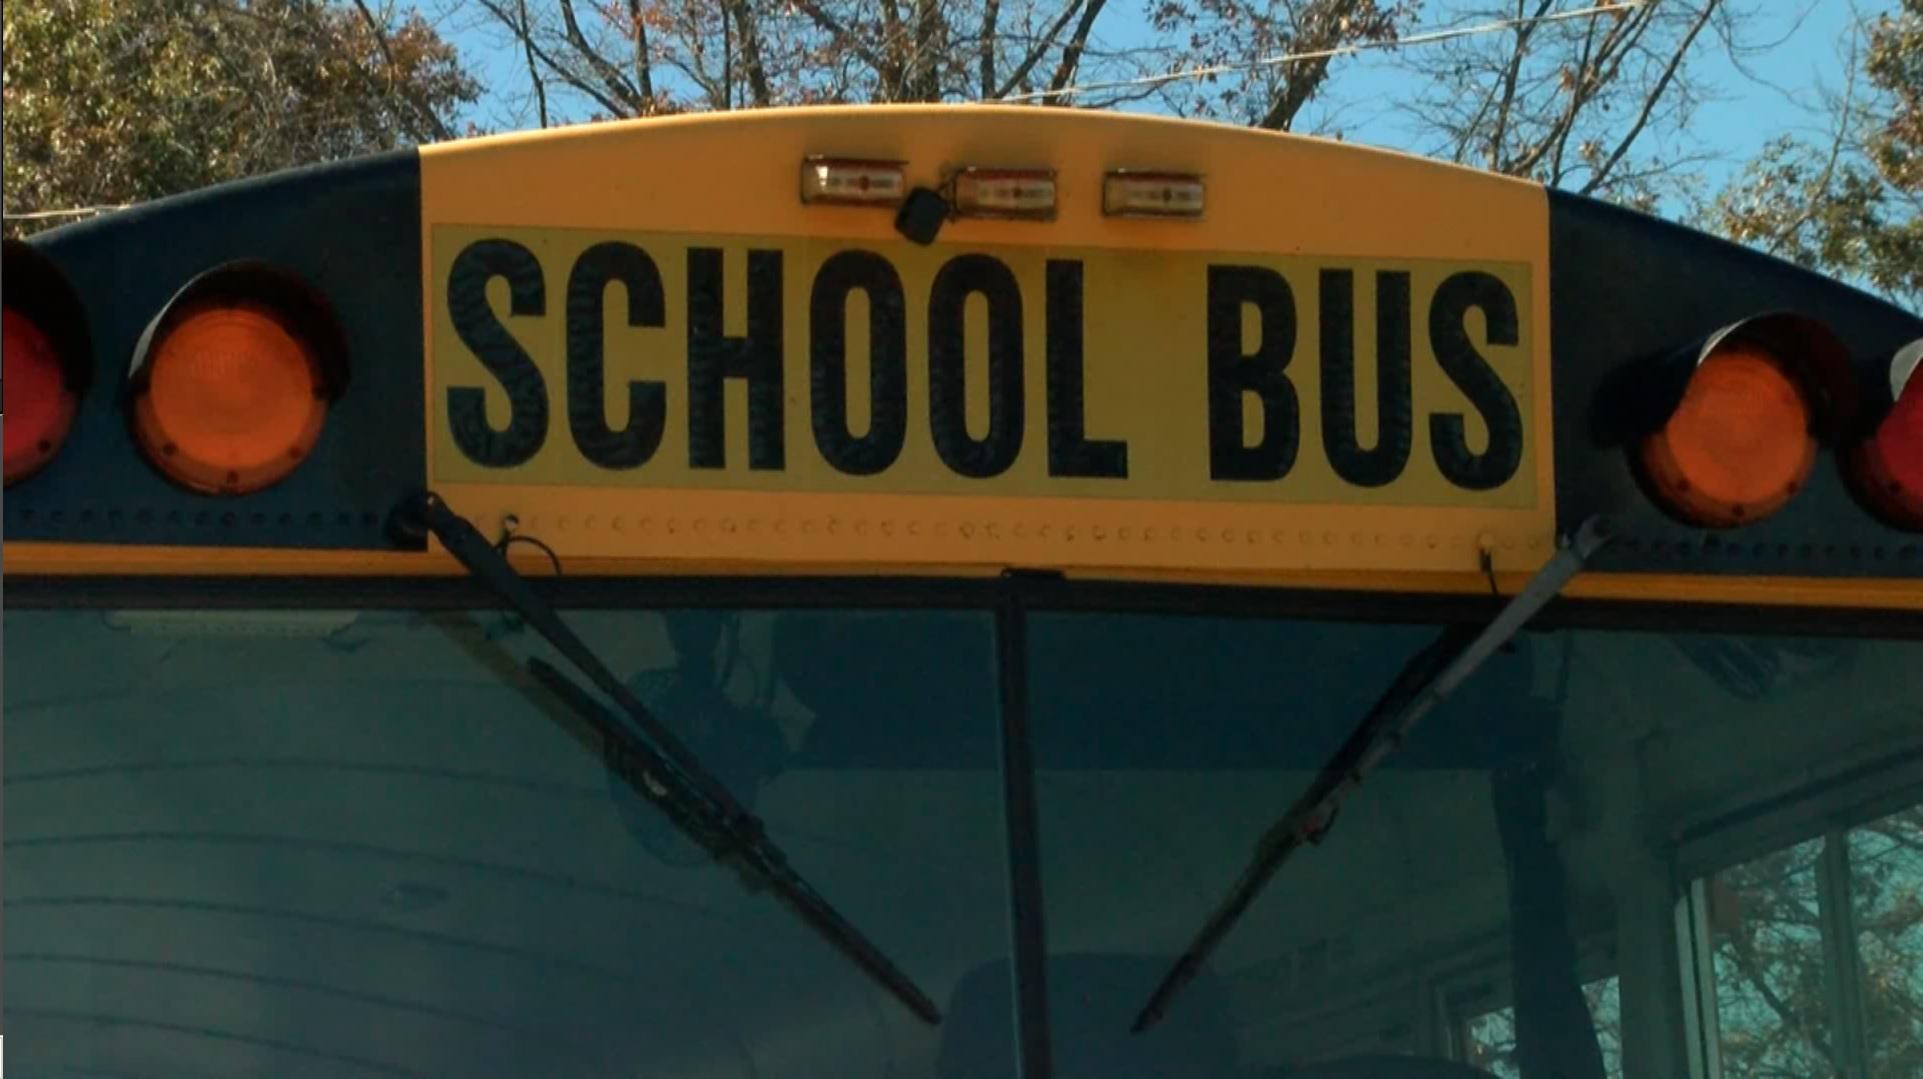 school-bus-nate_257963